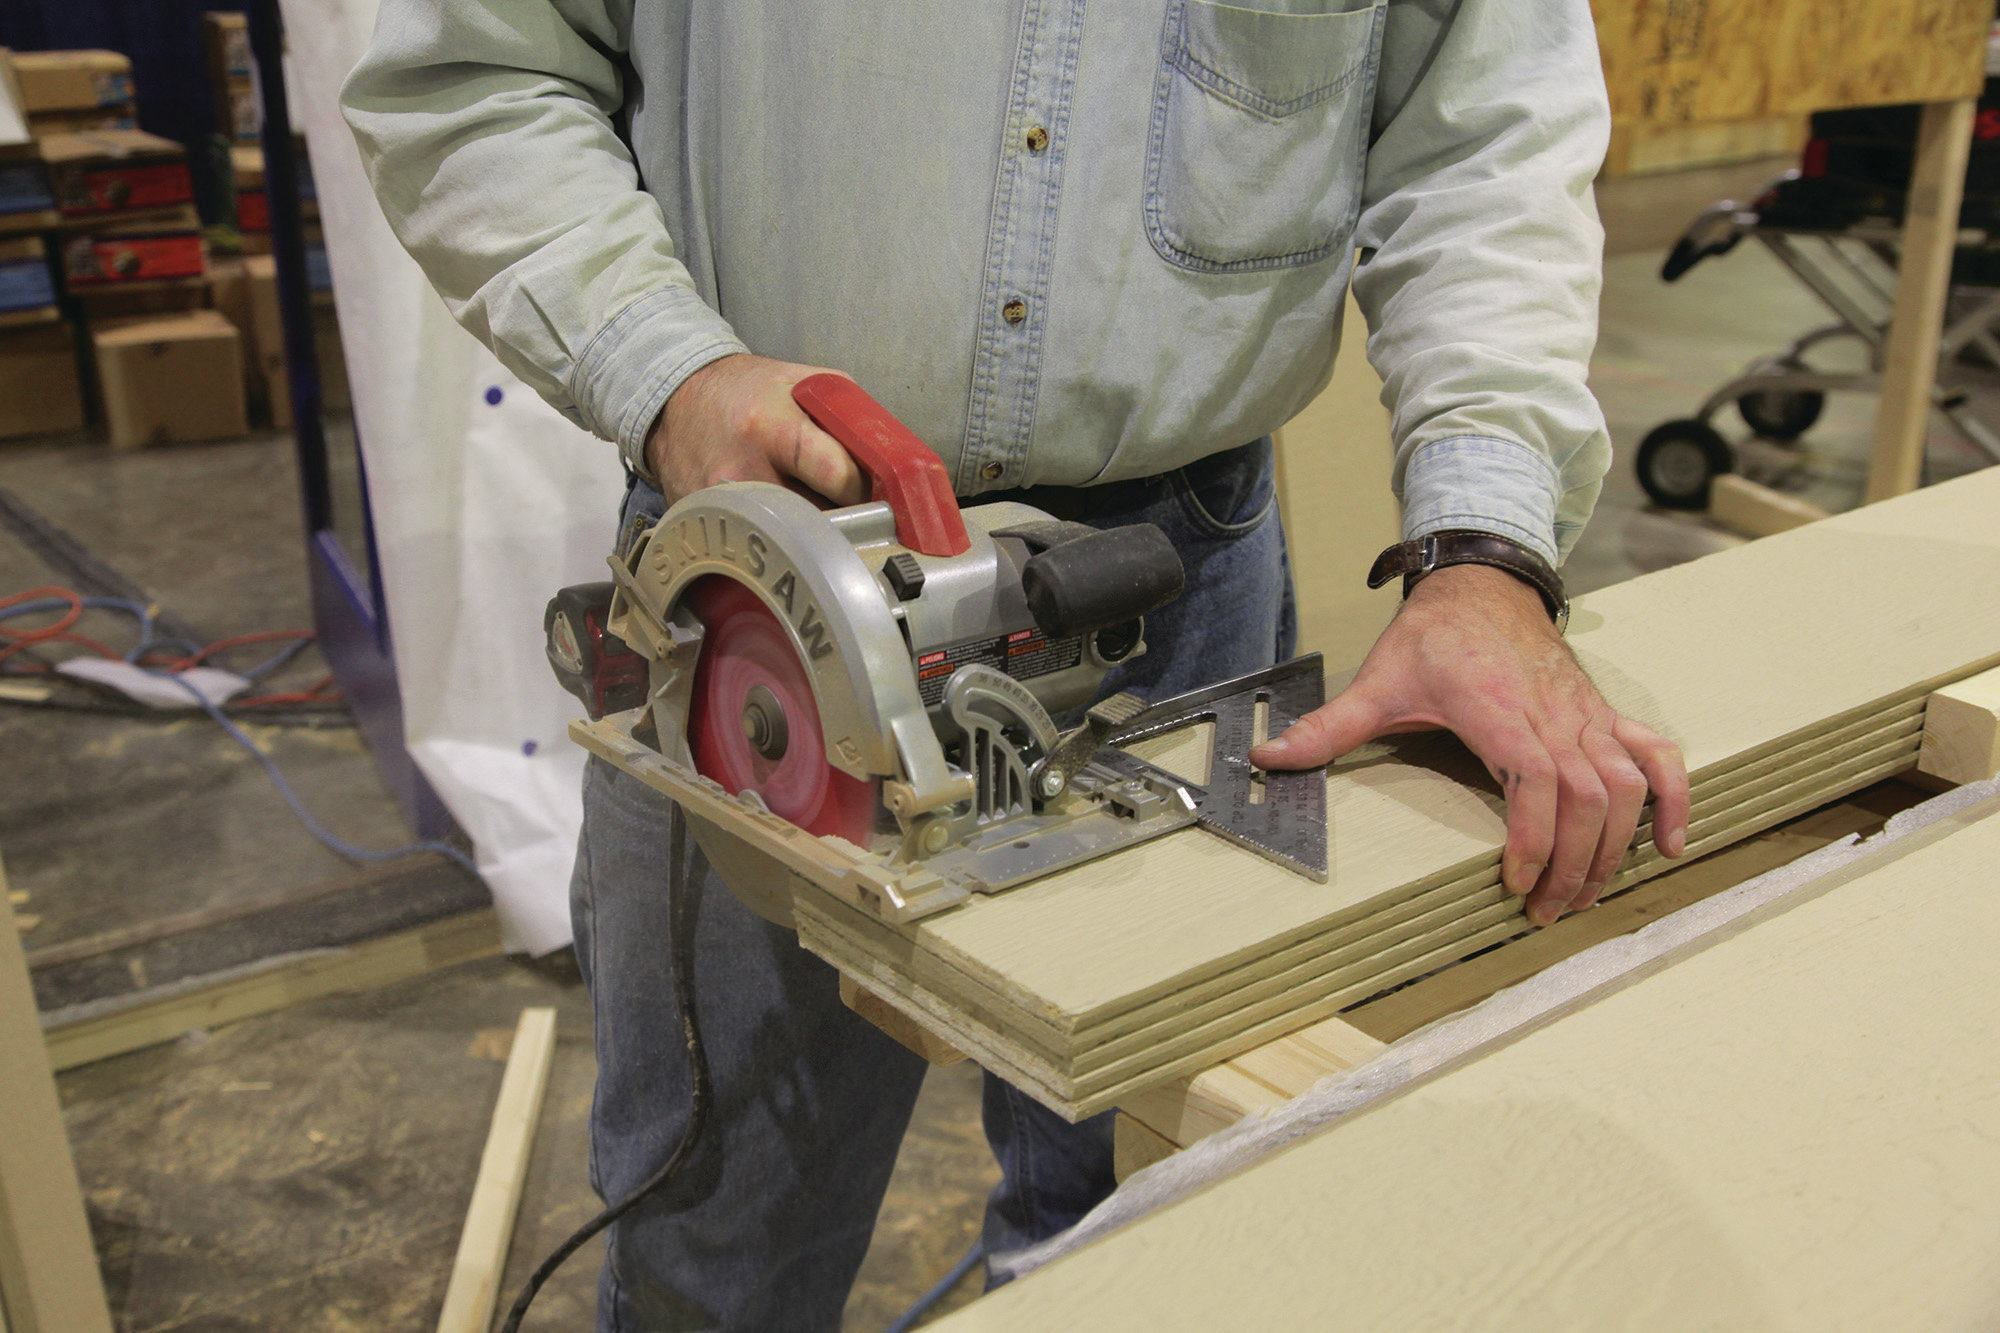 Cutting FiberCement Siding  JLC Online  Siding Power Tools